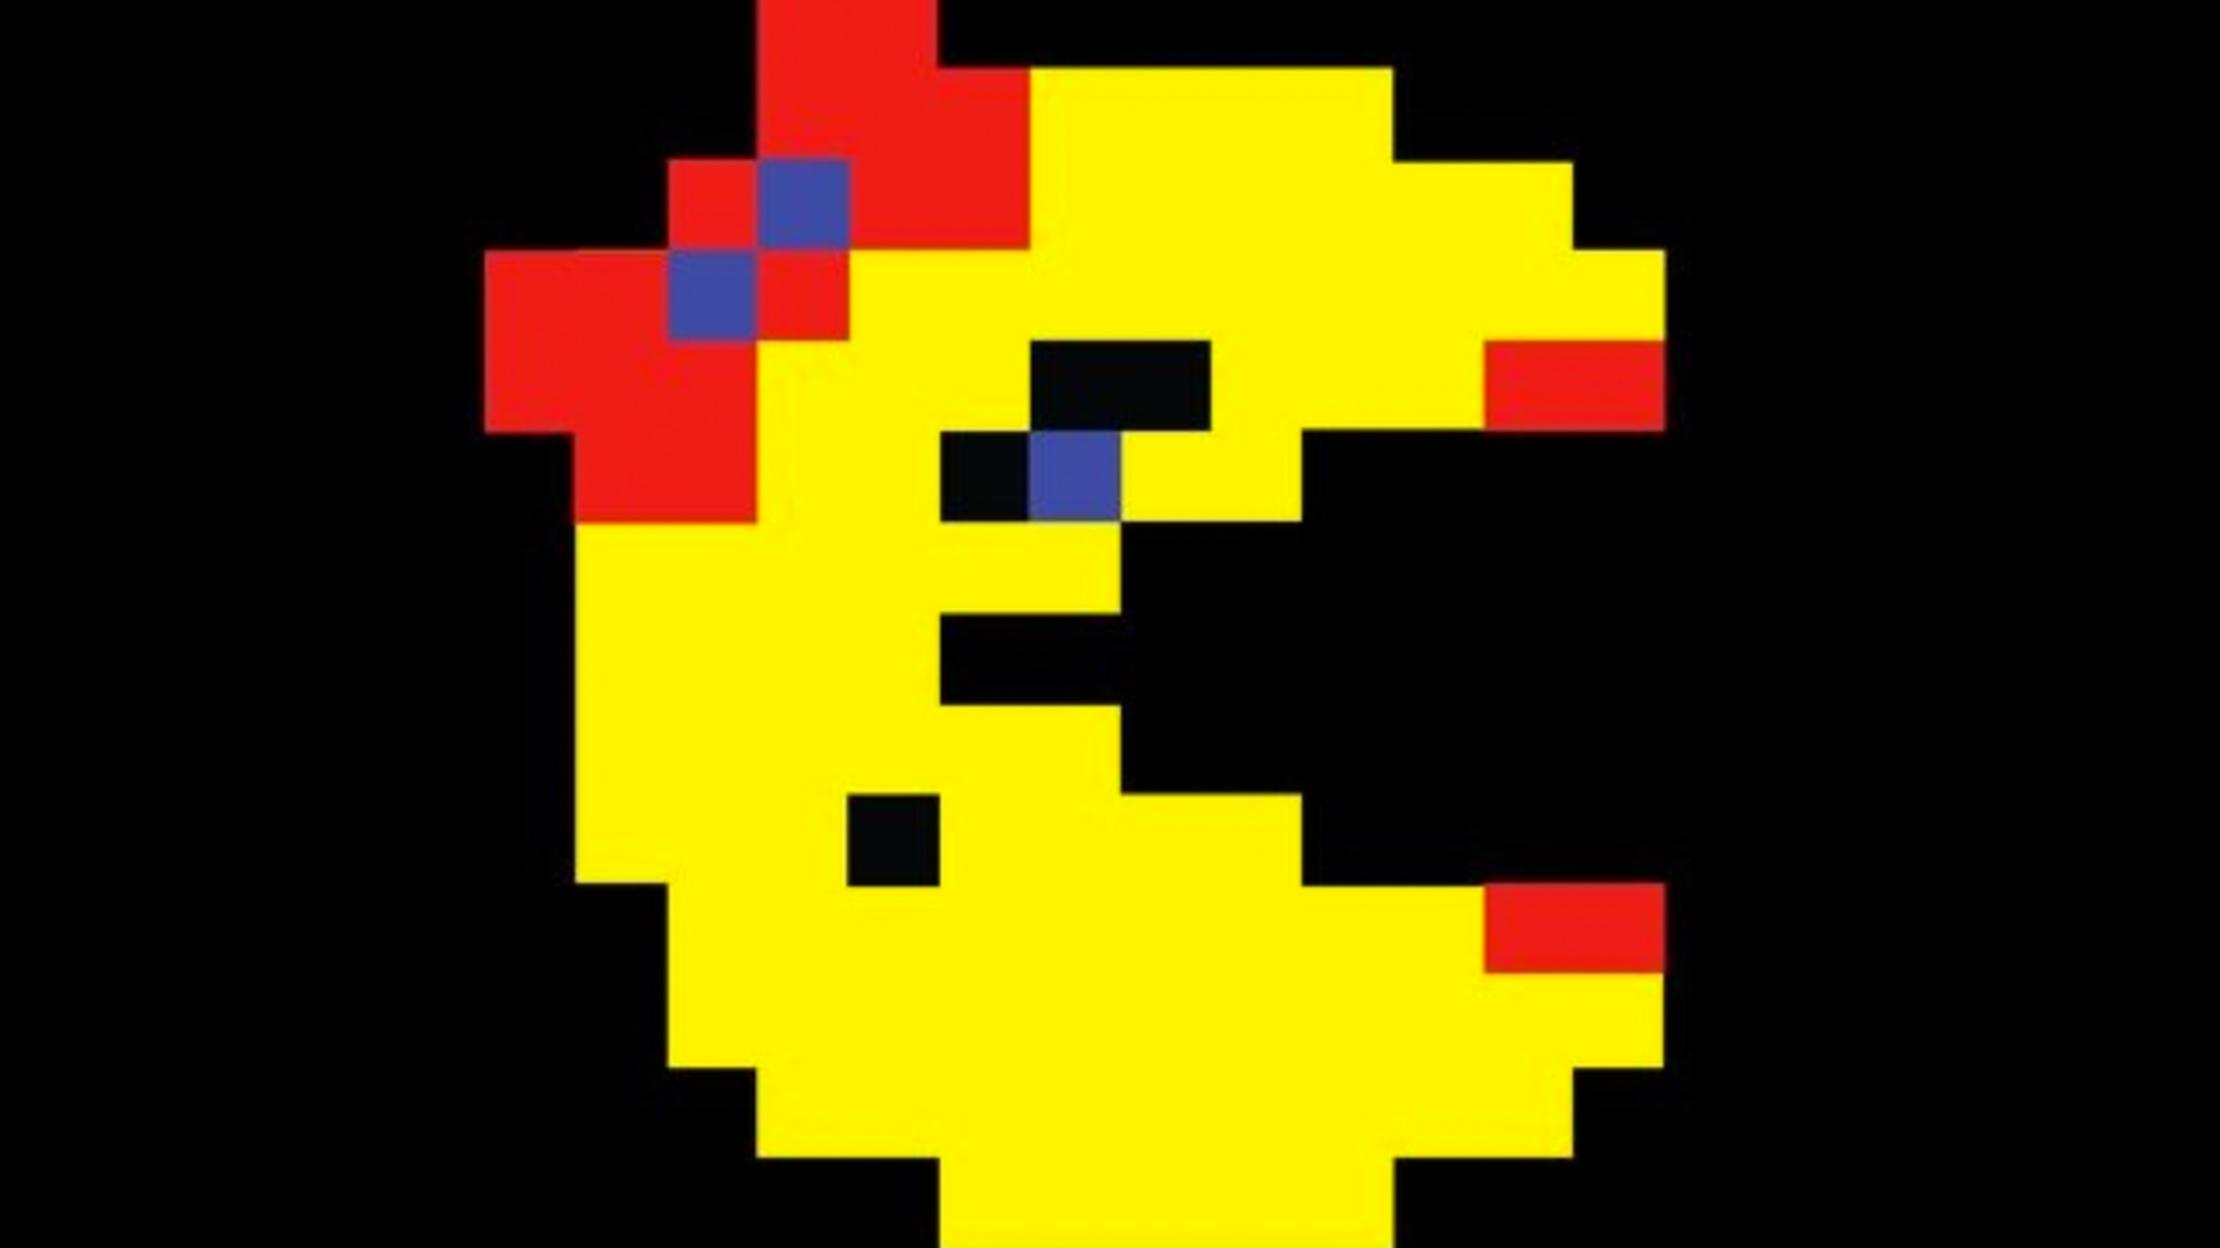 Retro Video Game Reviews: Ms. Pac-Man (NES)